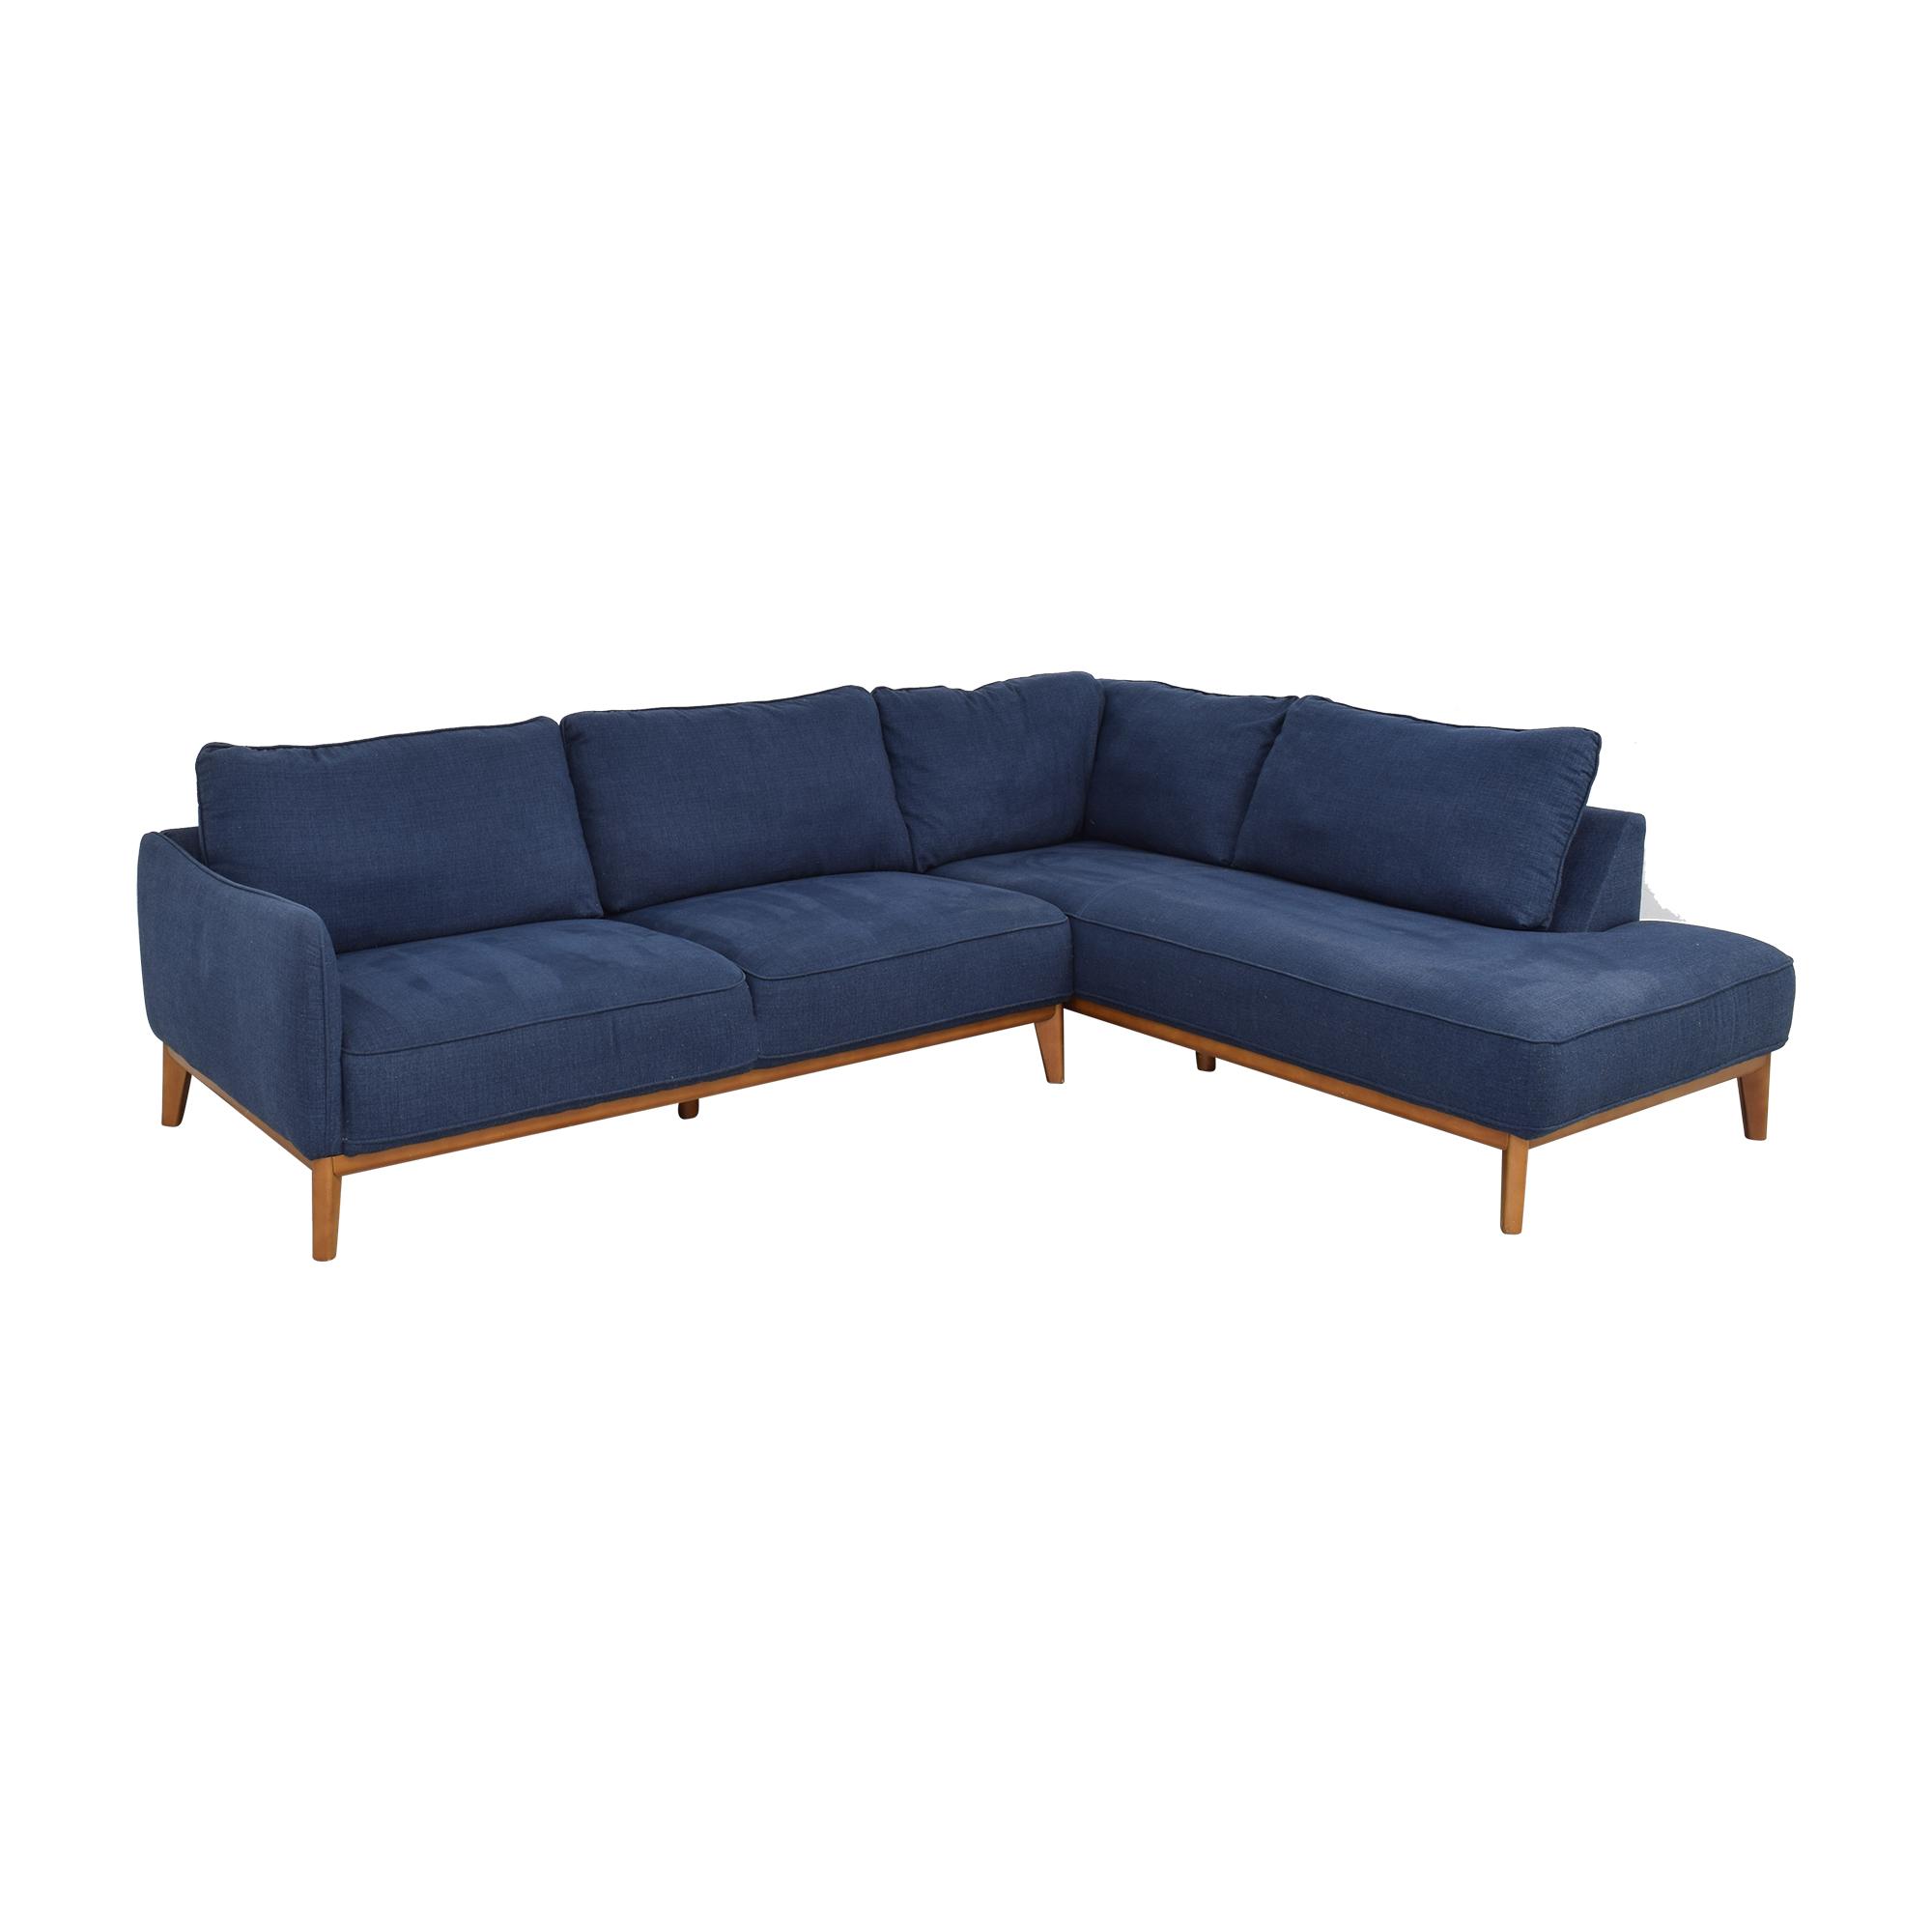 Jason Furniture Macy's Jollene Sectional Sofa used